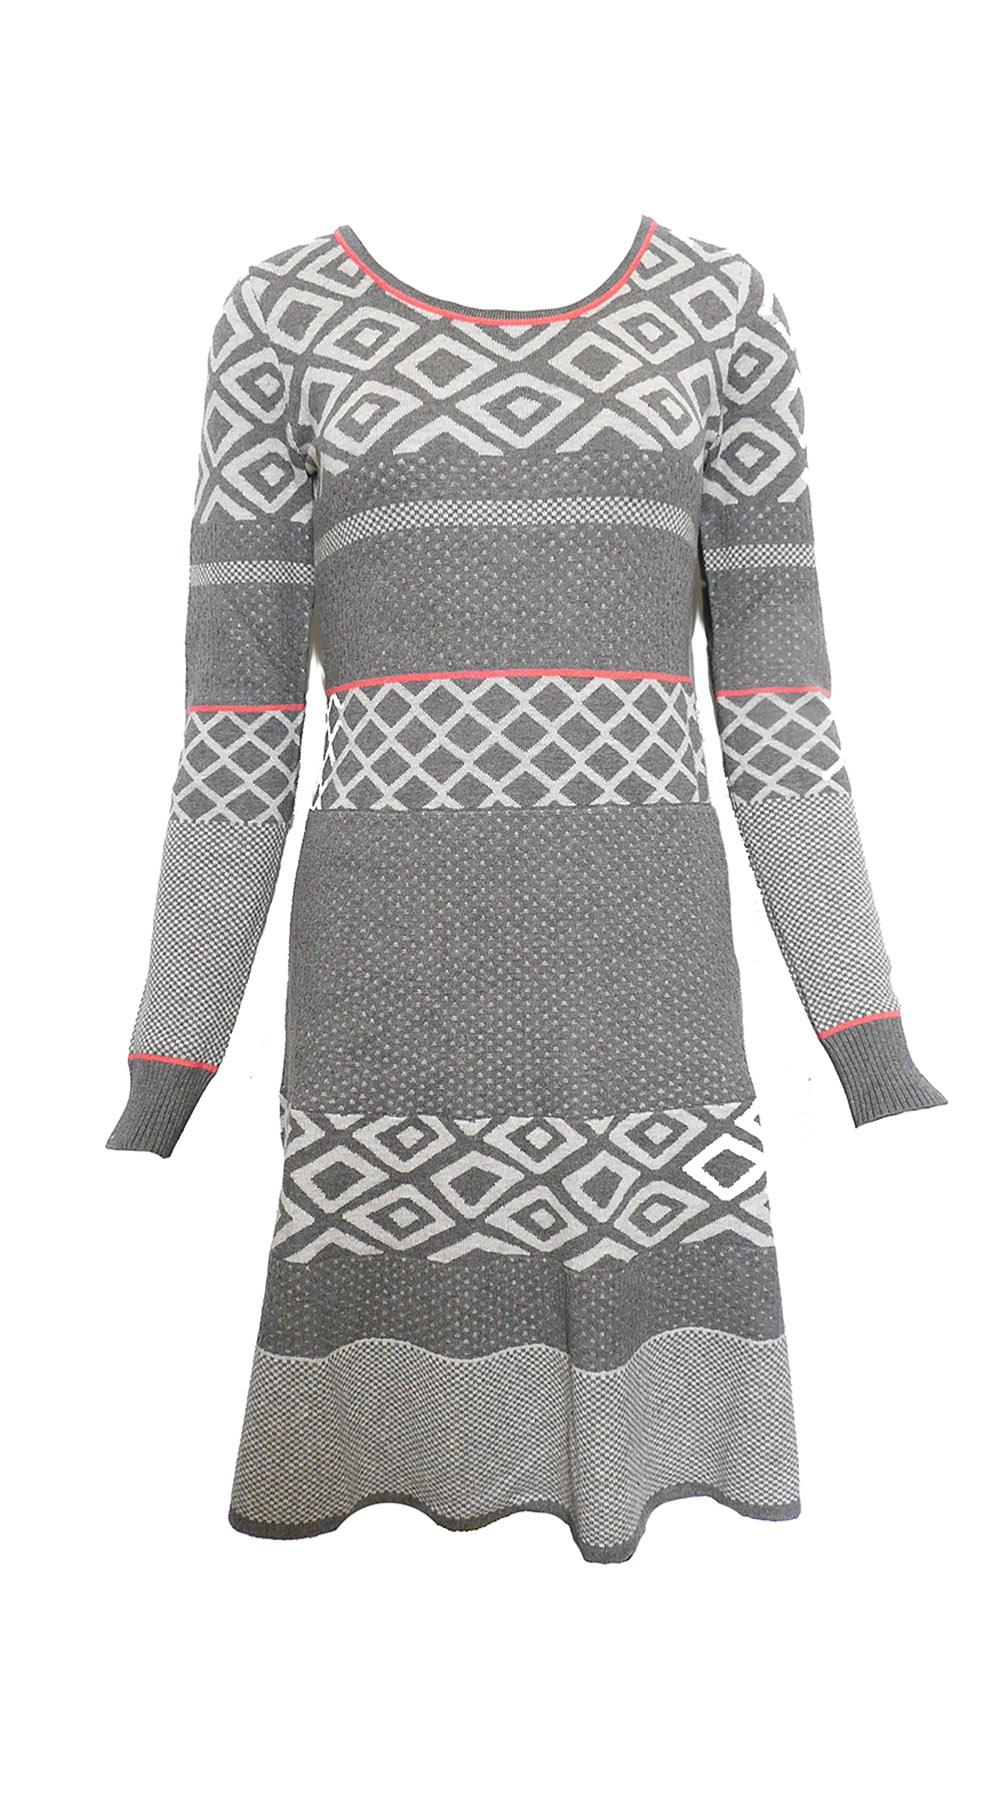 dress knit grey pattern.jpg